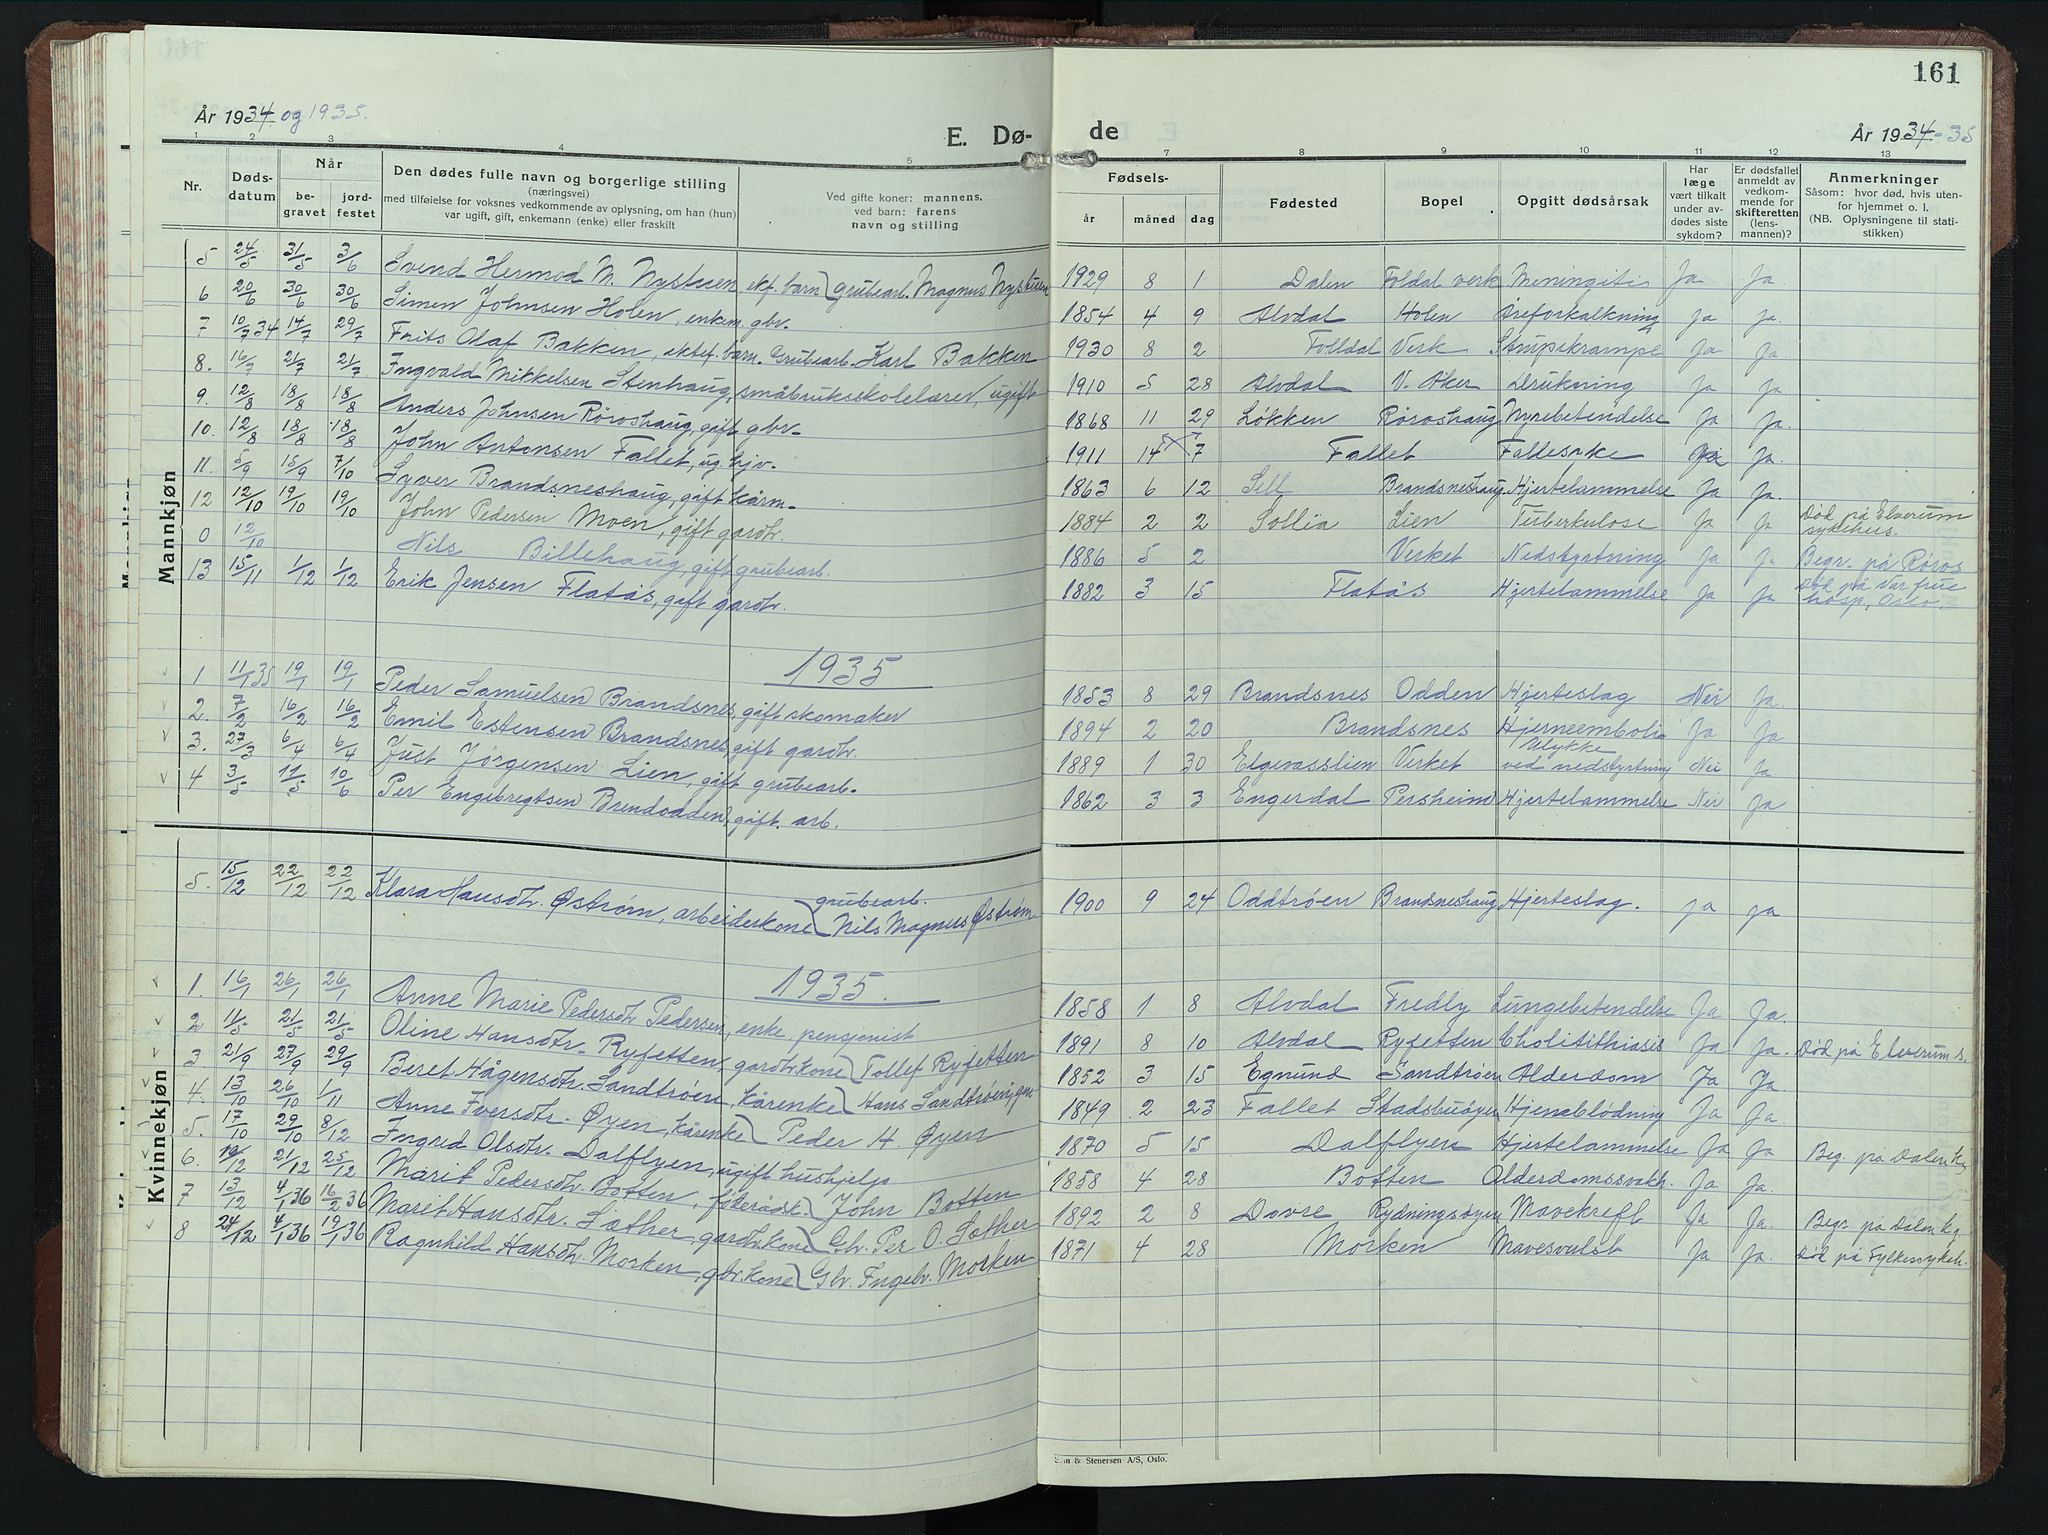 SAH, Alvdal prestekontor, Klokkerbok nr. 8, 1925-1953, s. 161